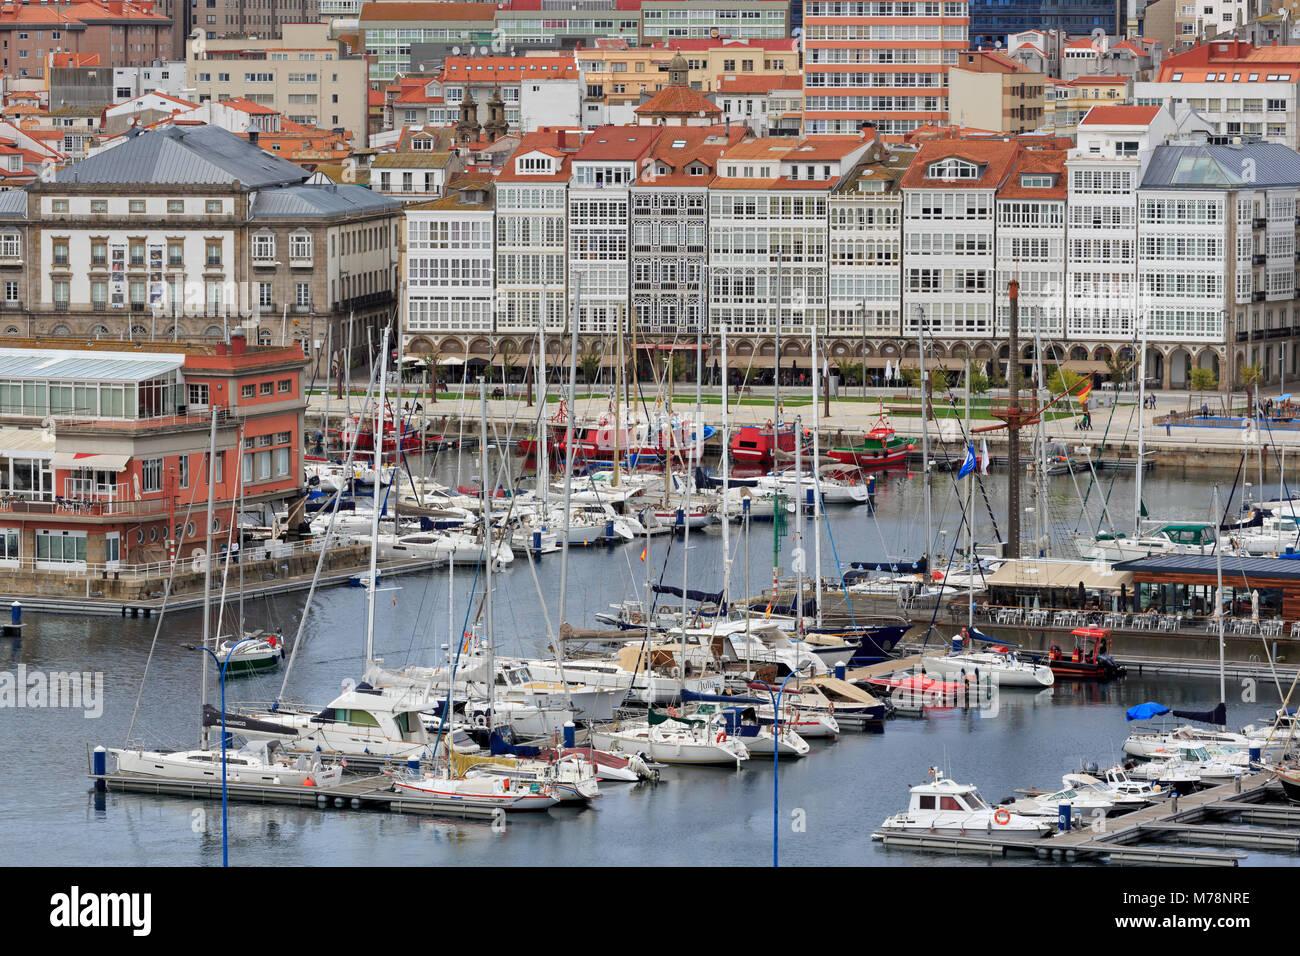 Yacht Marina, La Coruna City, Galicia, Spain, Europe - Stock Image